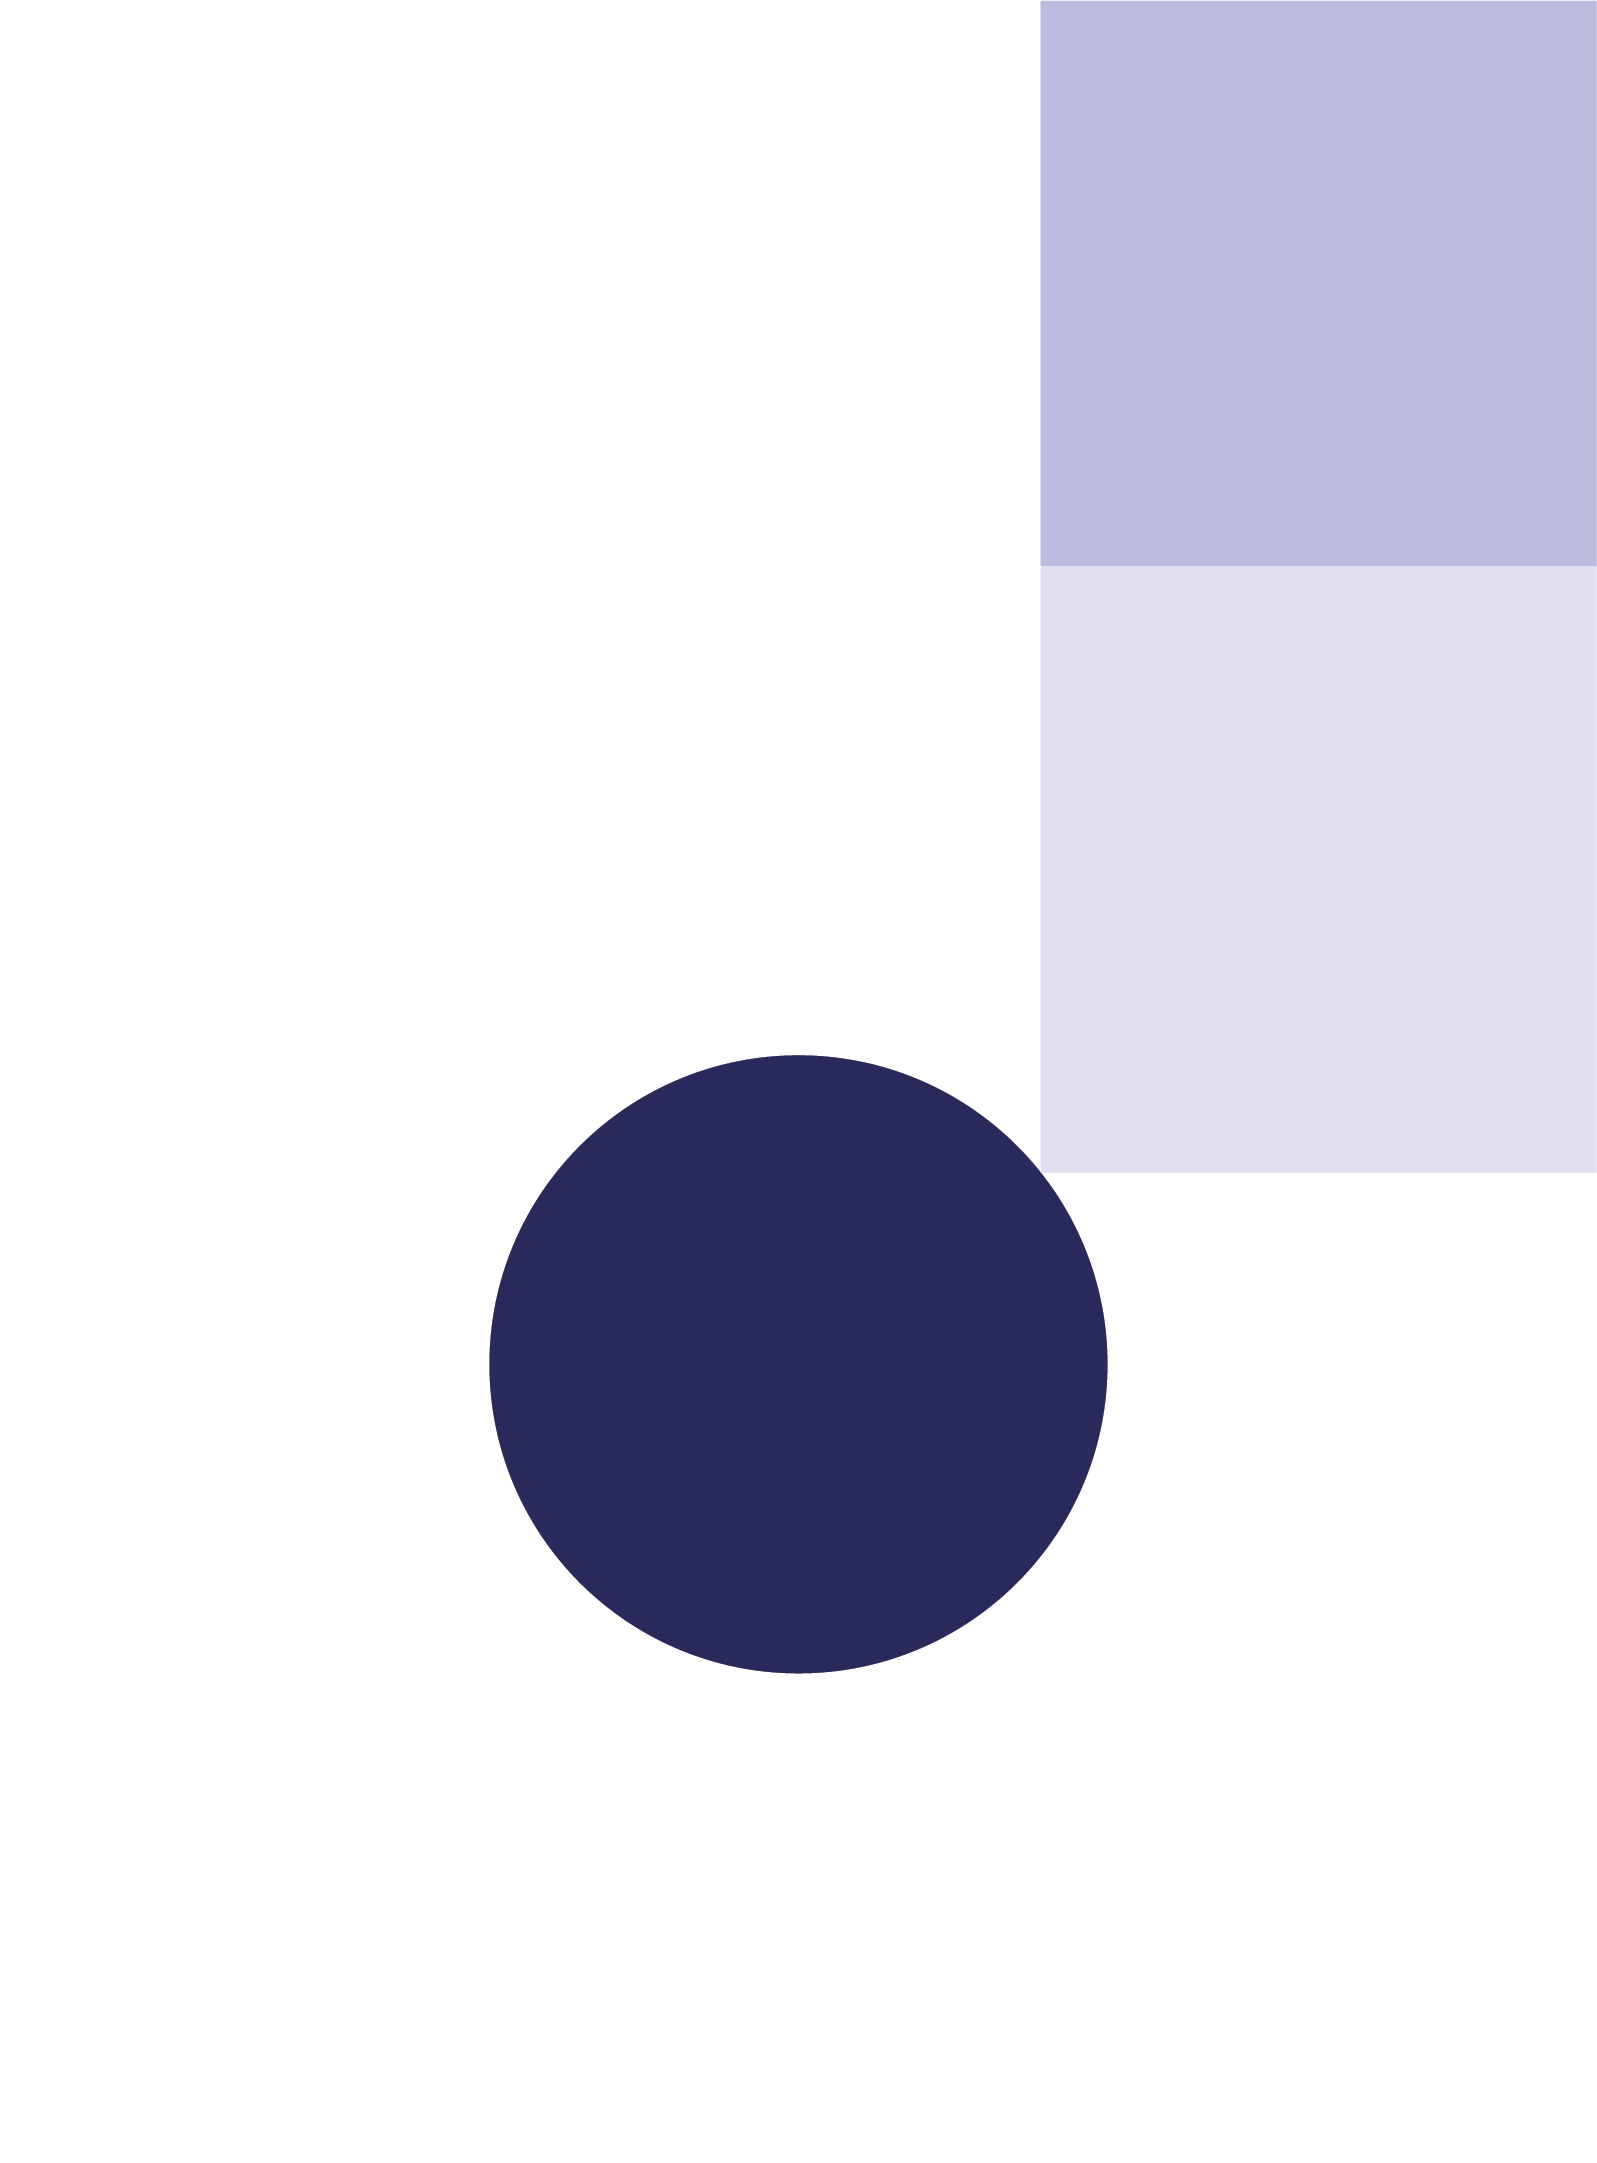 DesignUpgrade